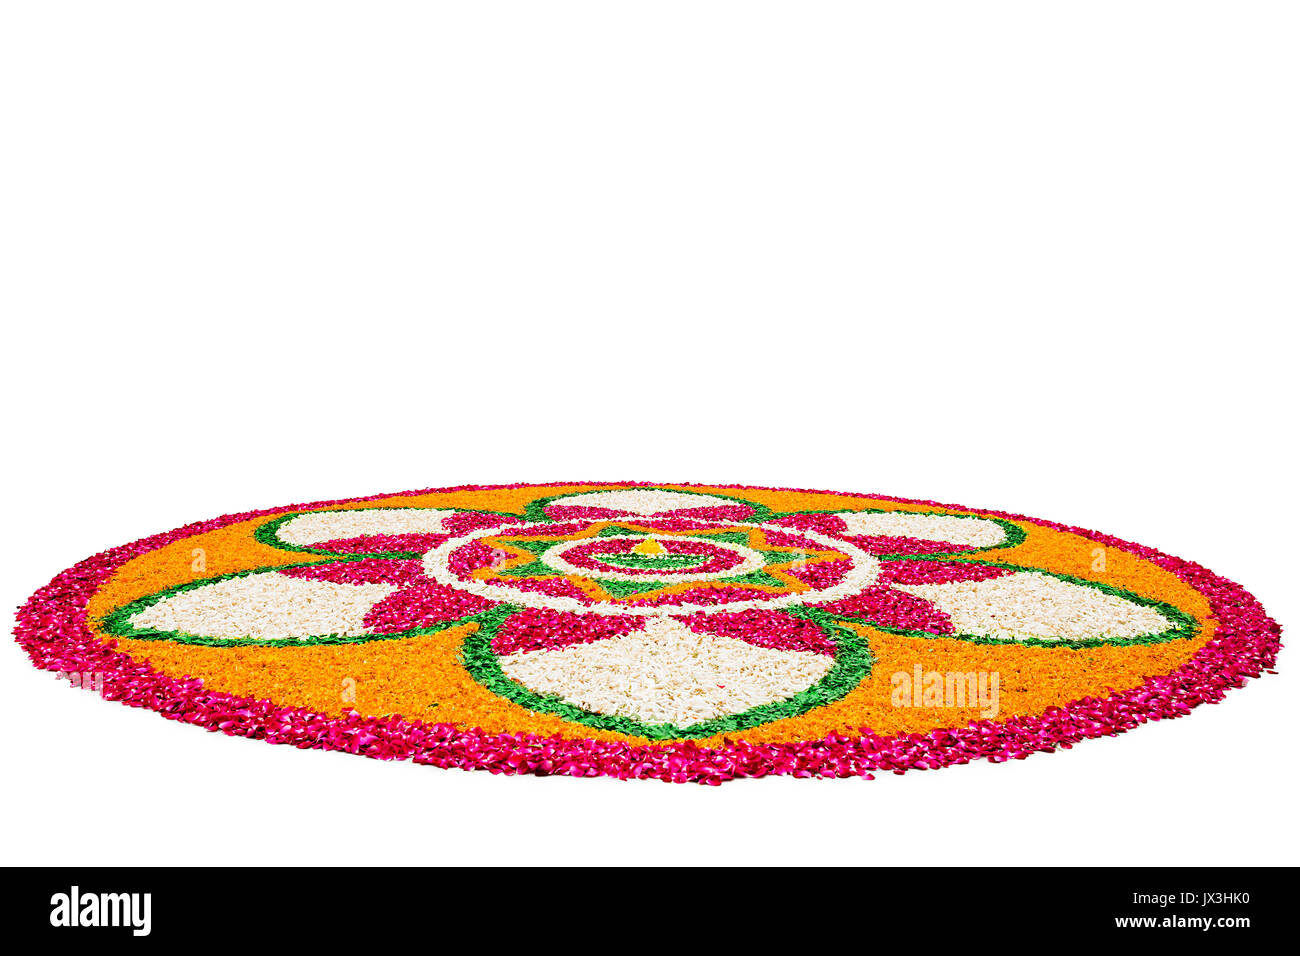 Flower Rangoli Designs Petals Rangoli Designs for Diwali Festival ... for Flower Rangoli Designs For Diwali  585hul